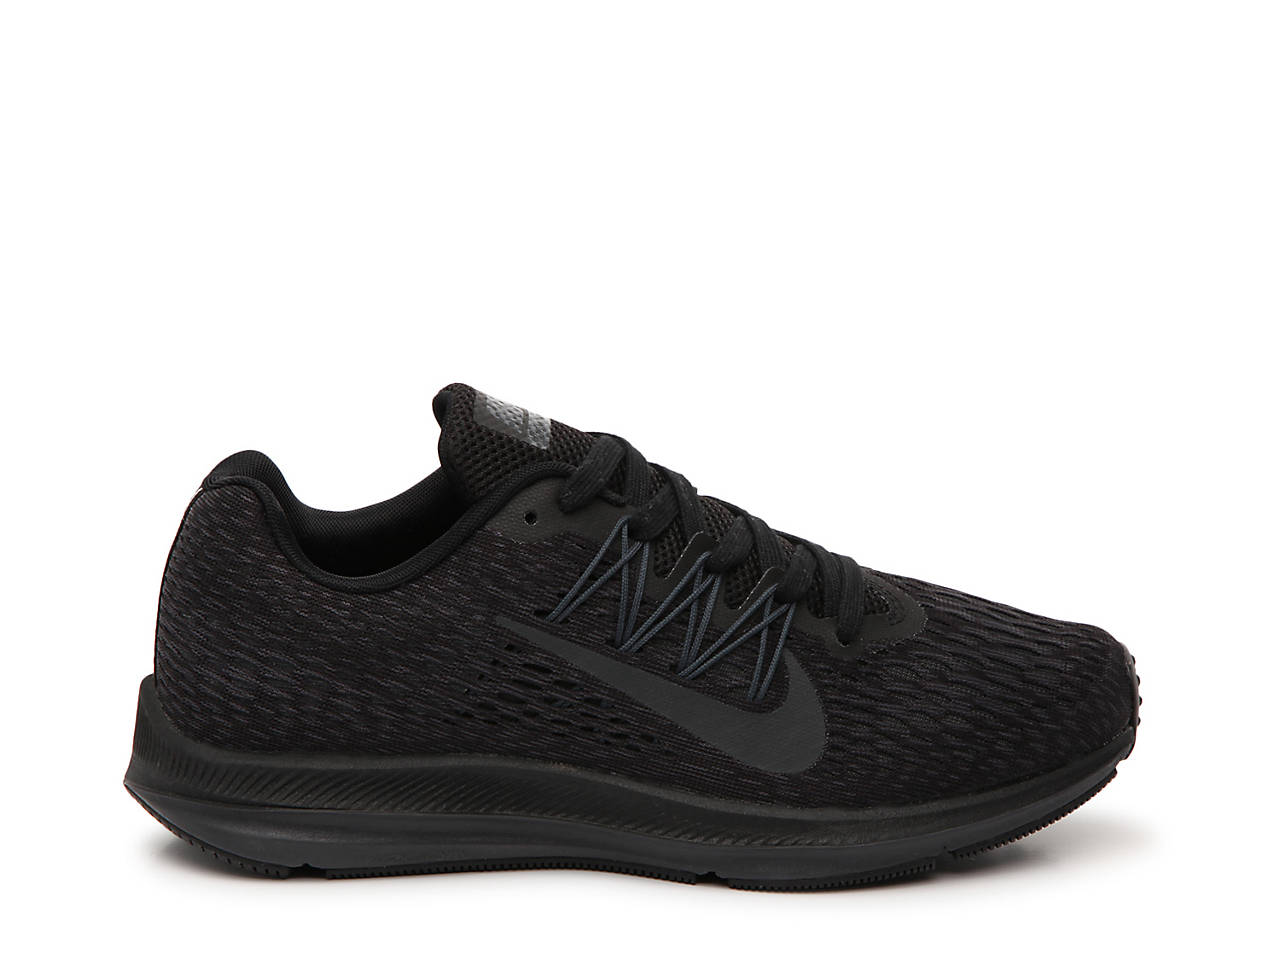 huge discount ee9ac 99c47 Nike Zoom Winflo 5 Running Shoe - Women s Women s Shoes   DSW